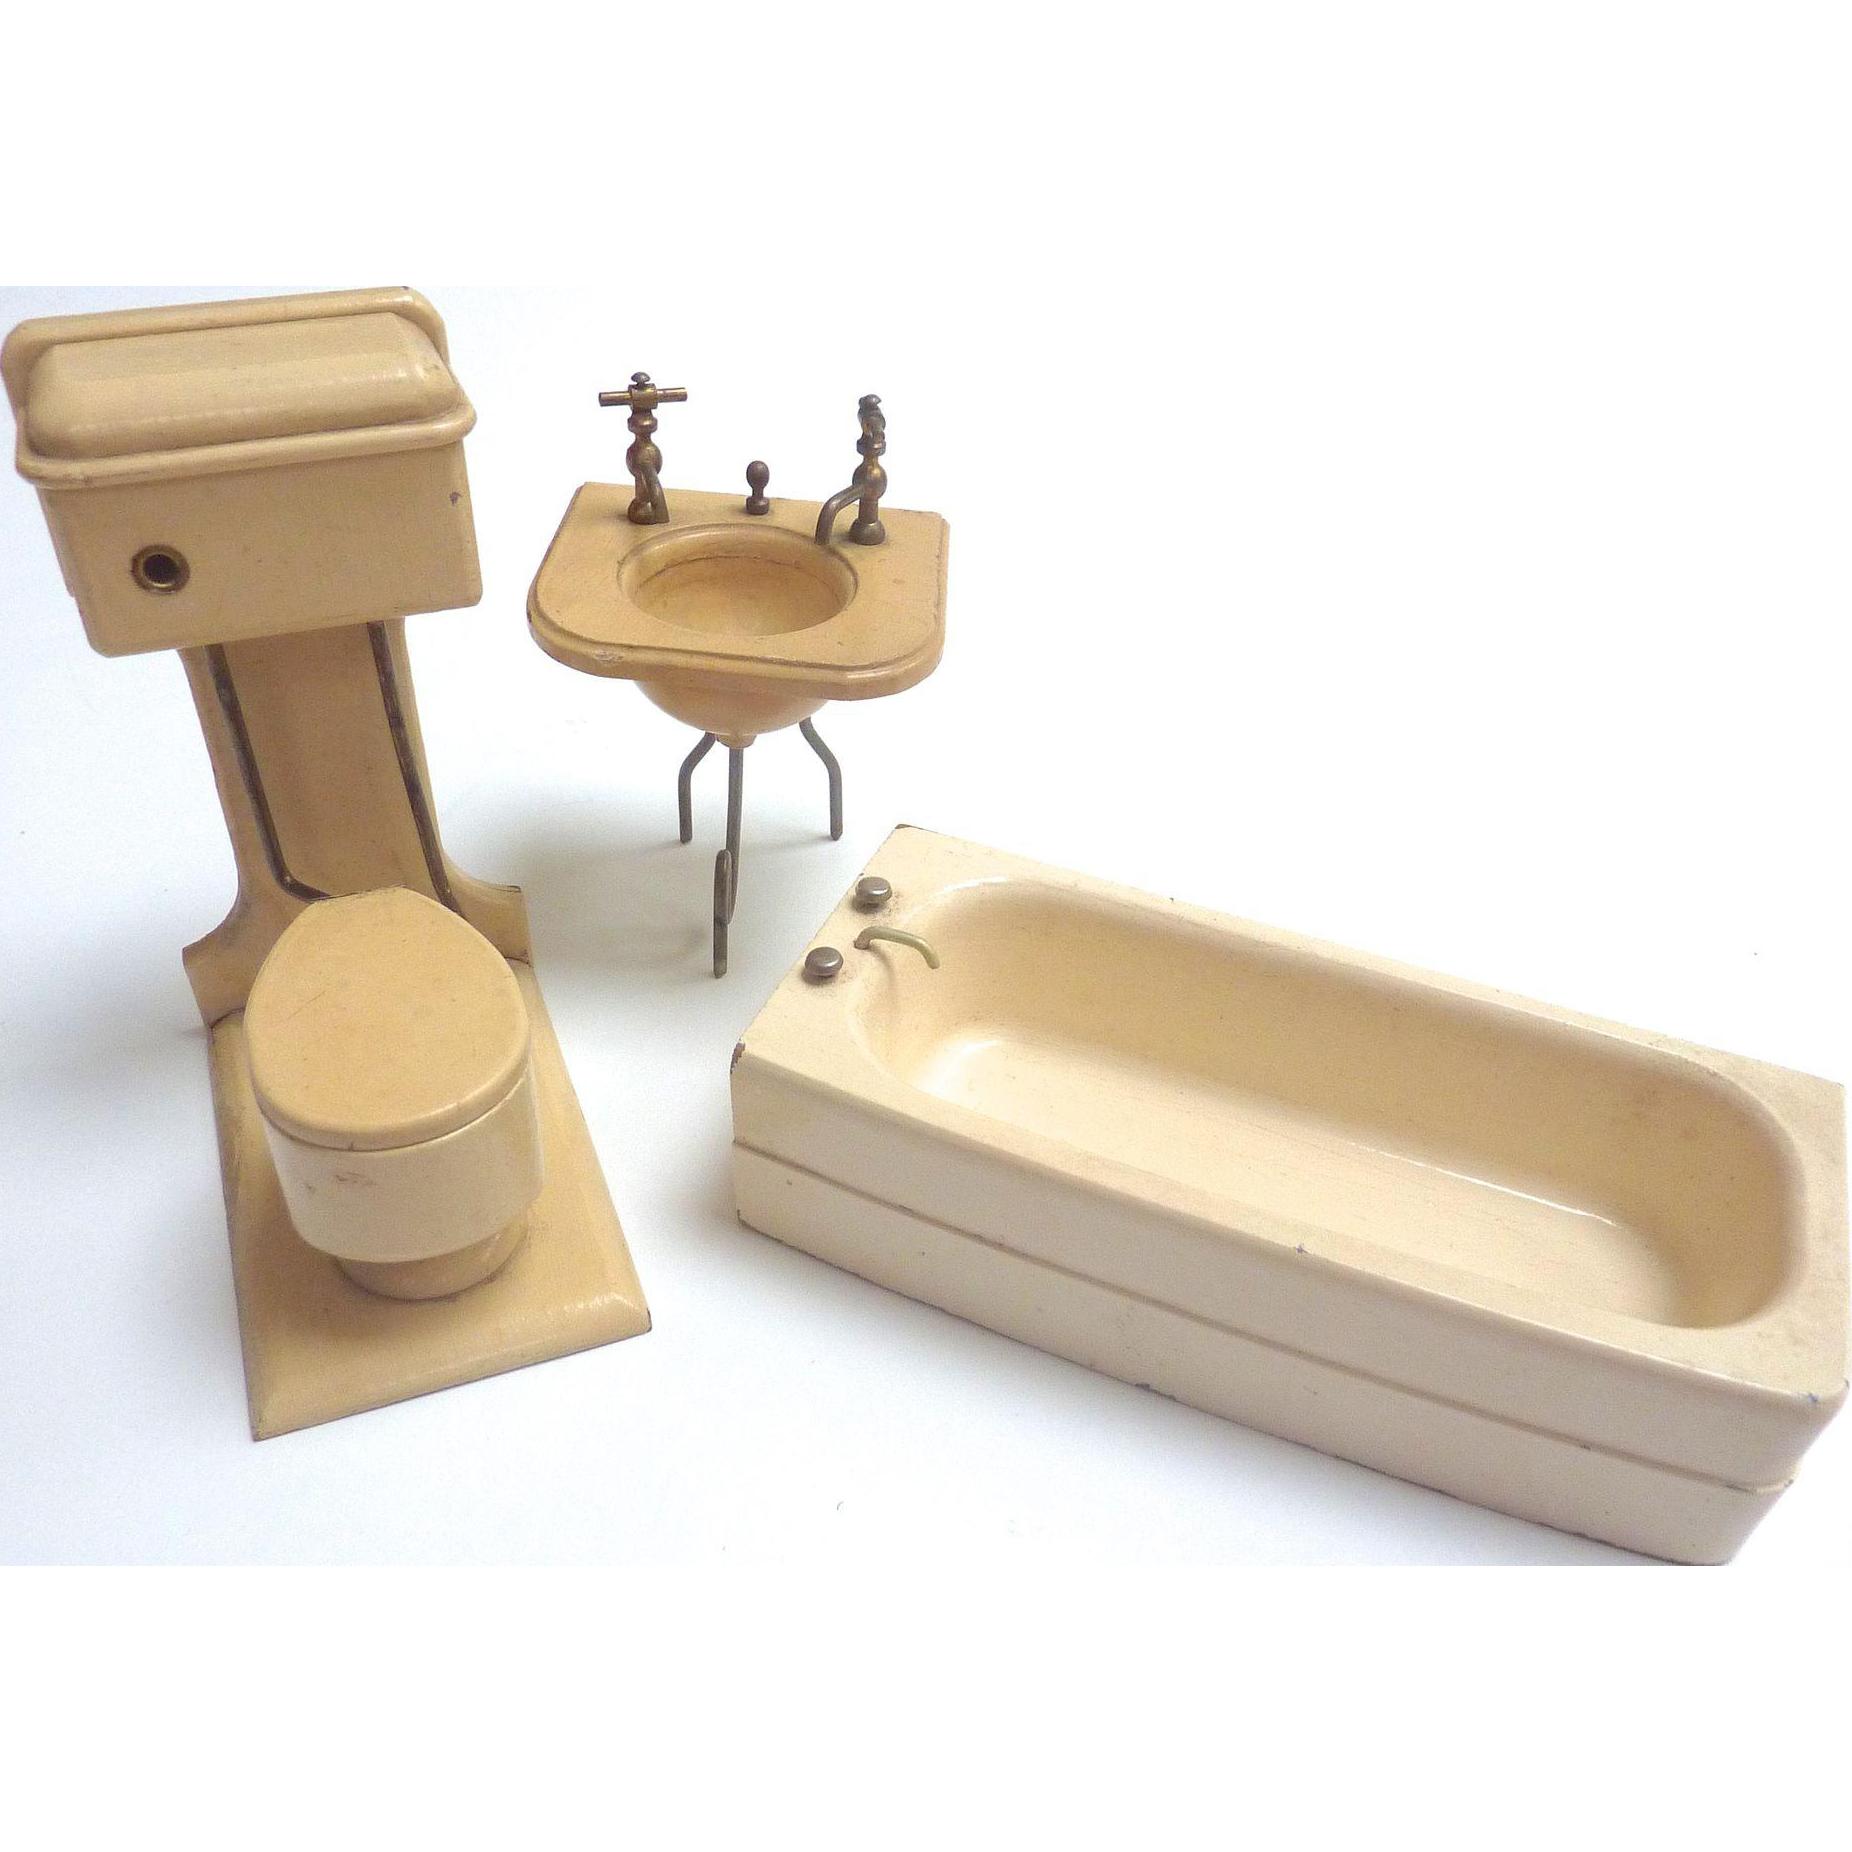 Vintage GERMAN Dollhouse Miniature Wooden BATHROOM Toilet ...